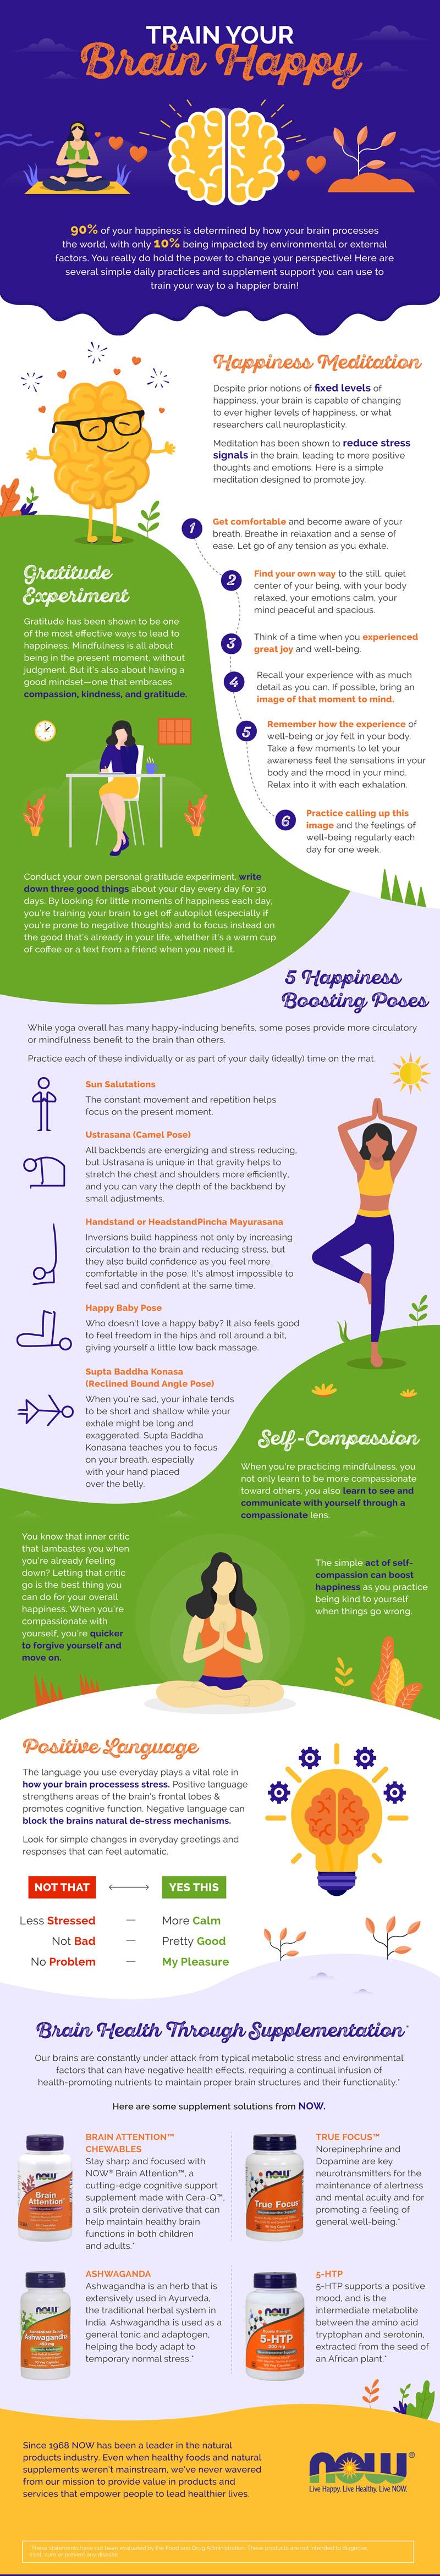 yoga journal brain happy infographic